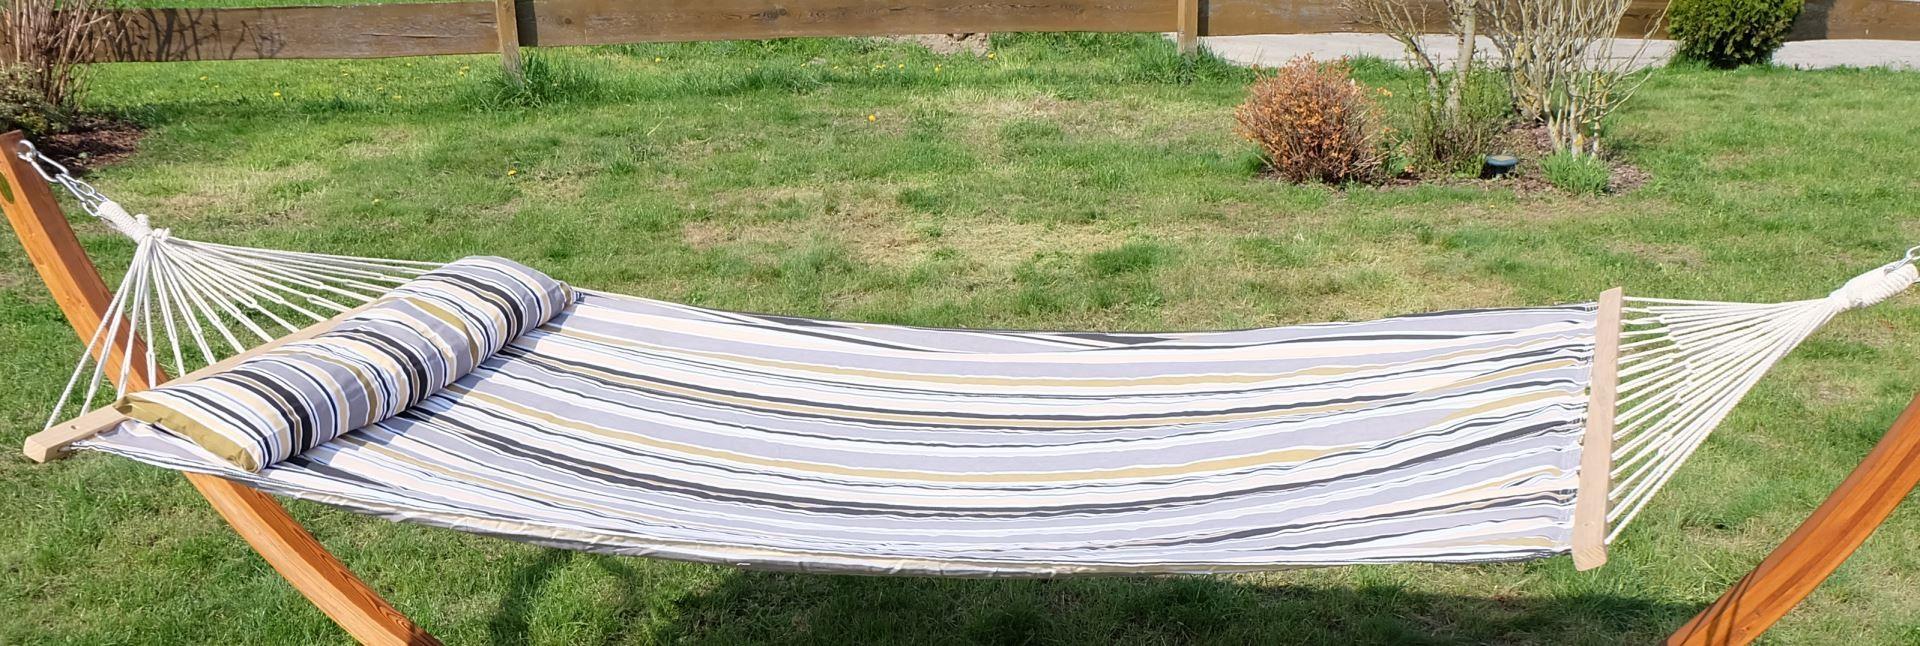 design h ngematte 120x200cm gef ttert mit kopfkissen grau. Black Bedroom Furniture Sets. Home Design Ideas